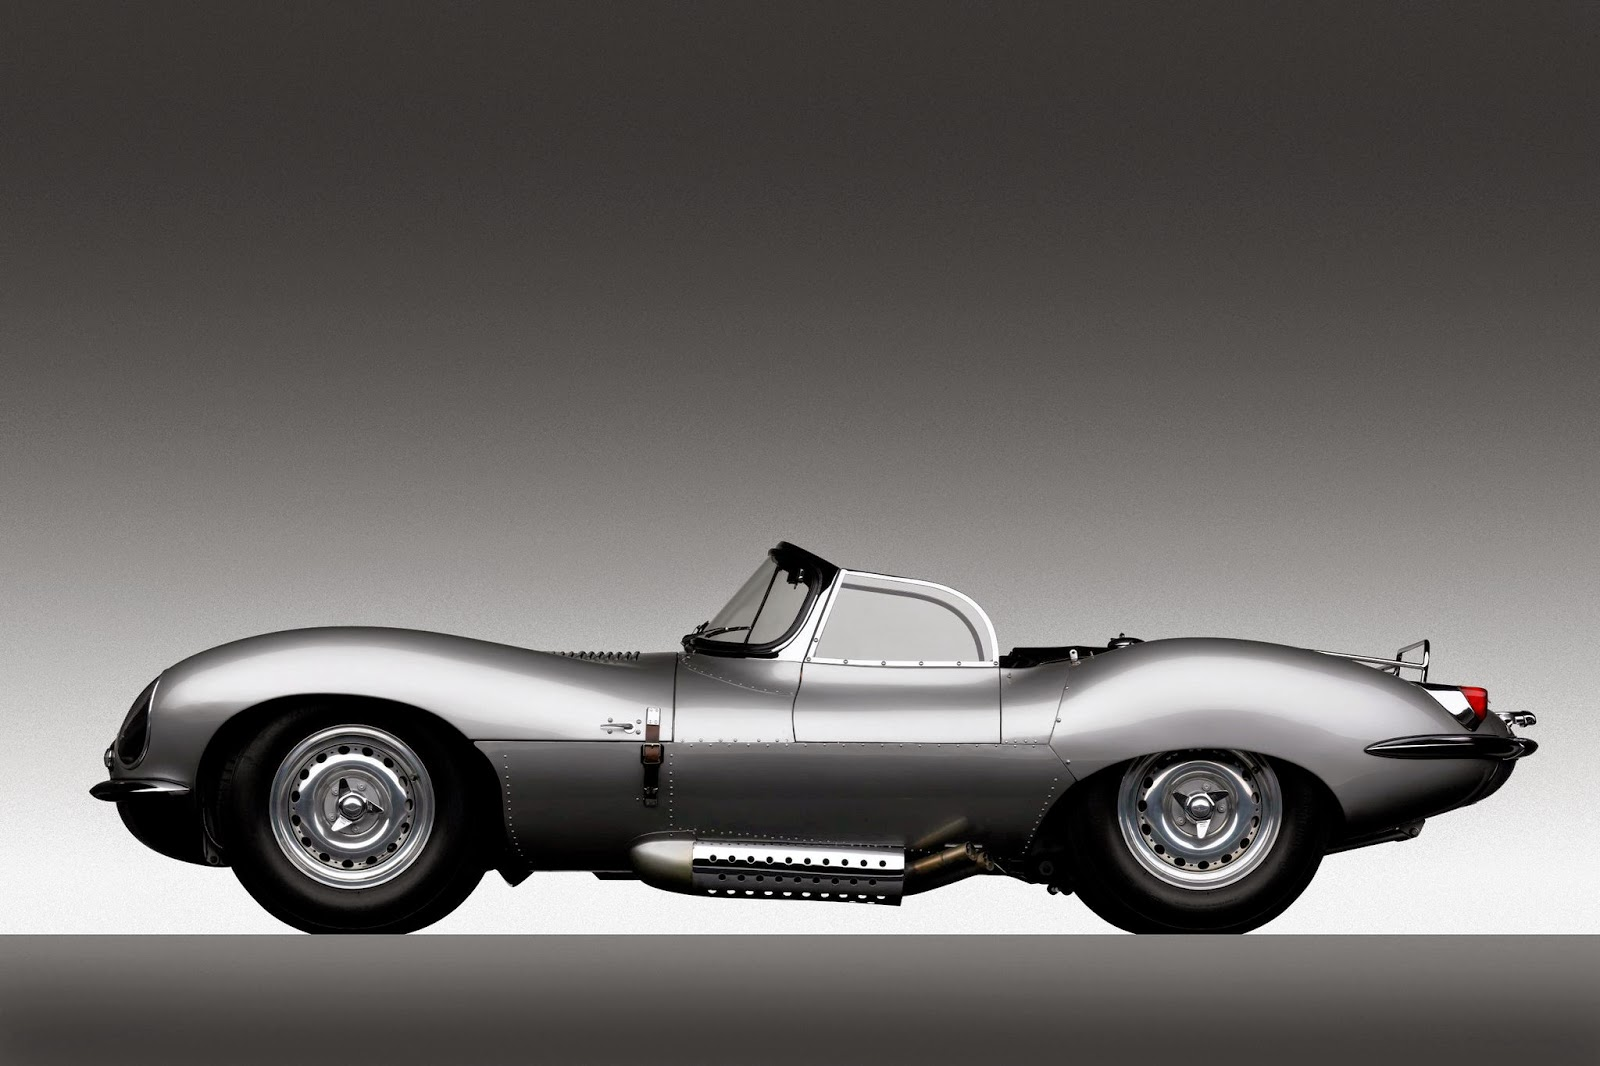 Classic Jaguar Convertible Cars